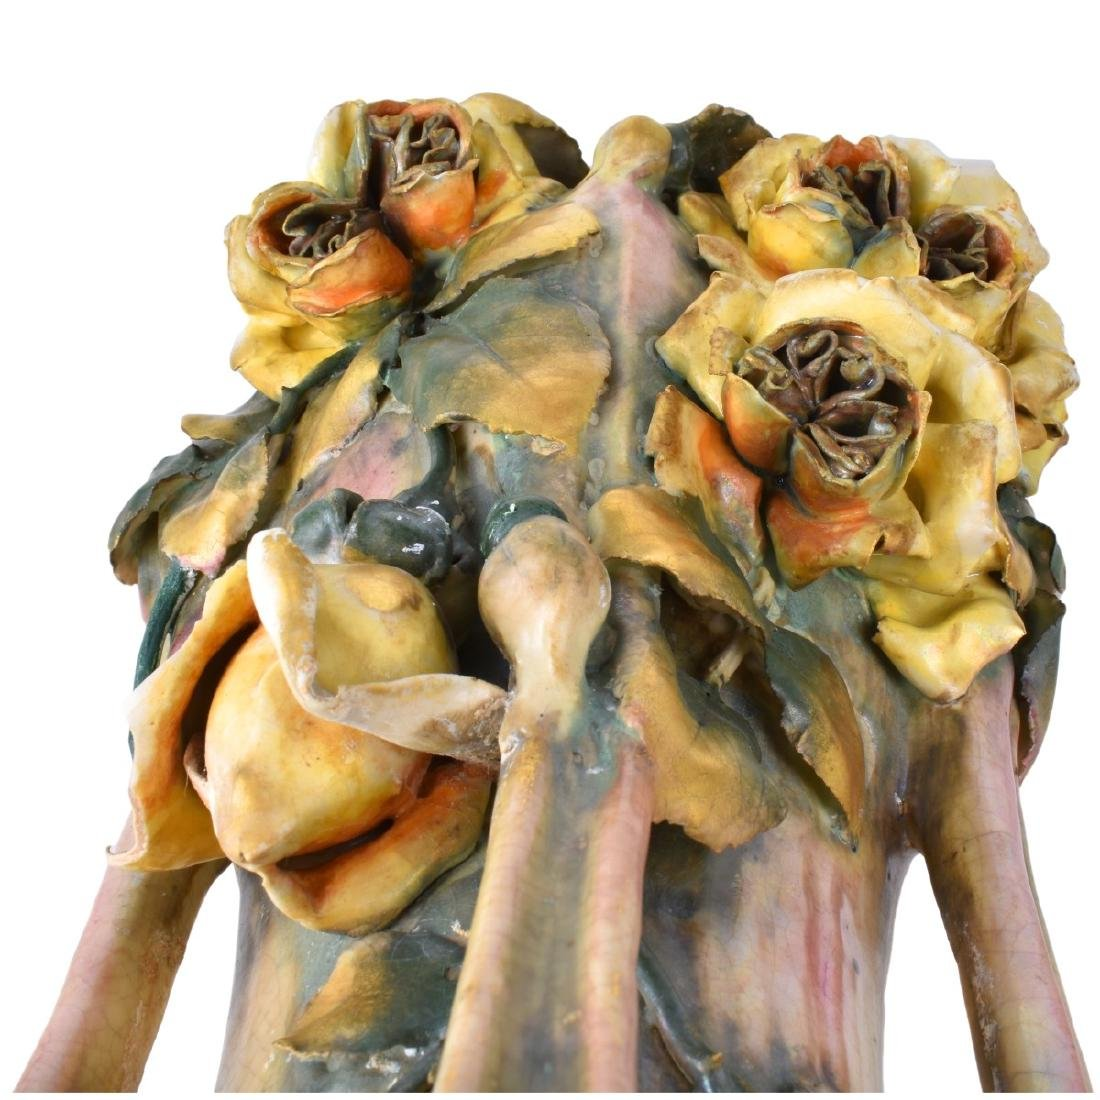 Amphora Edda Pottery Vase with Raised Flowers - 4